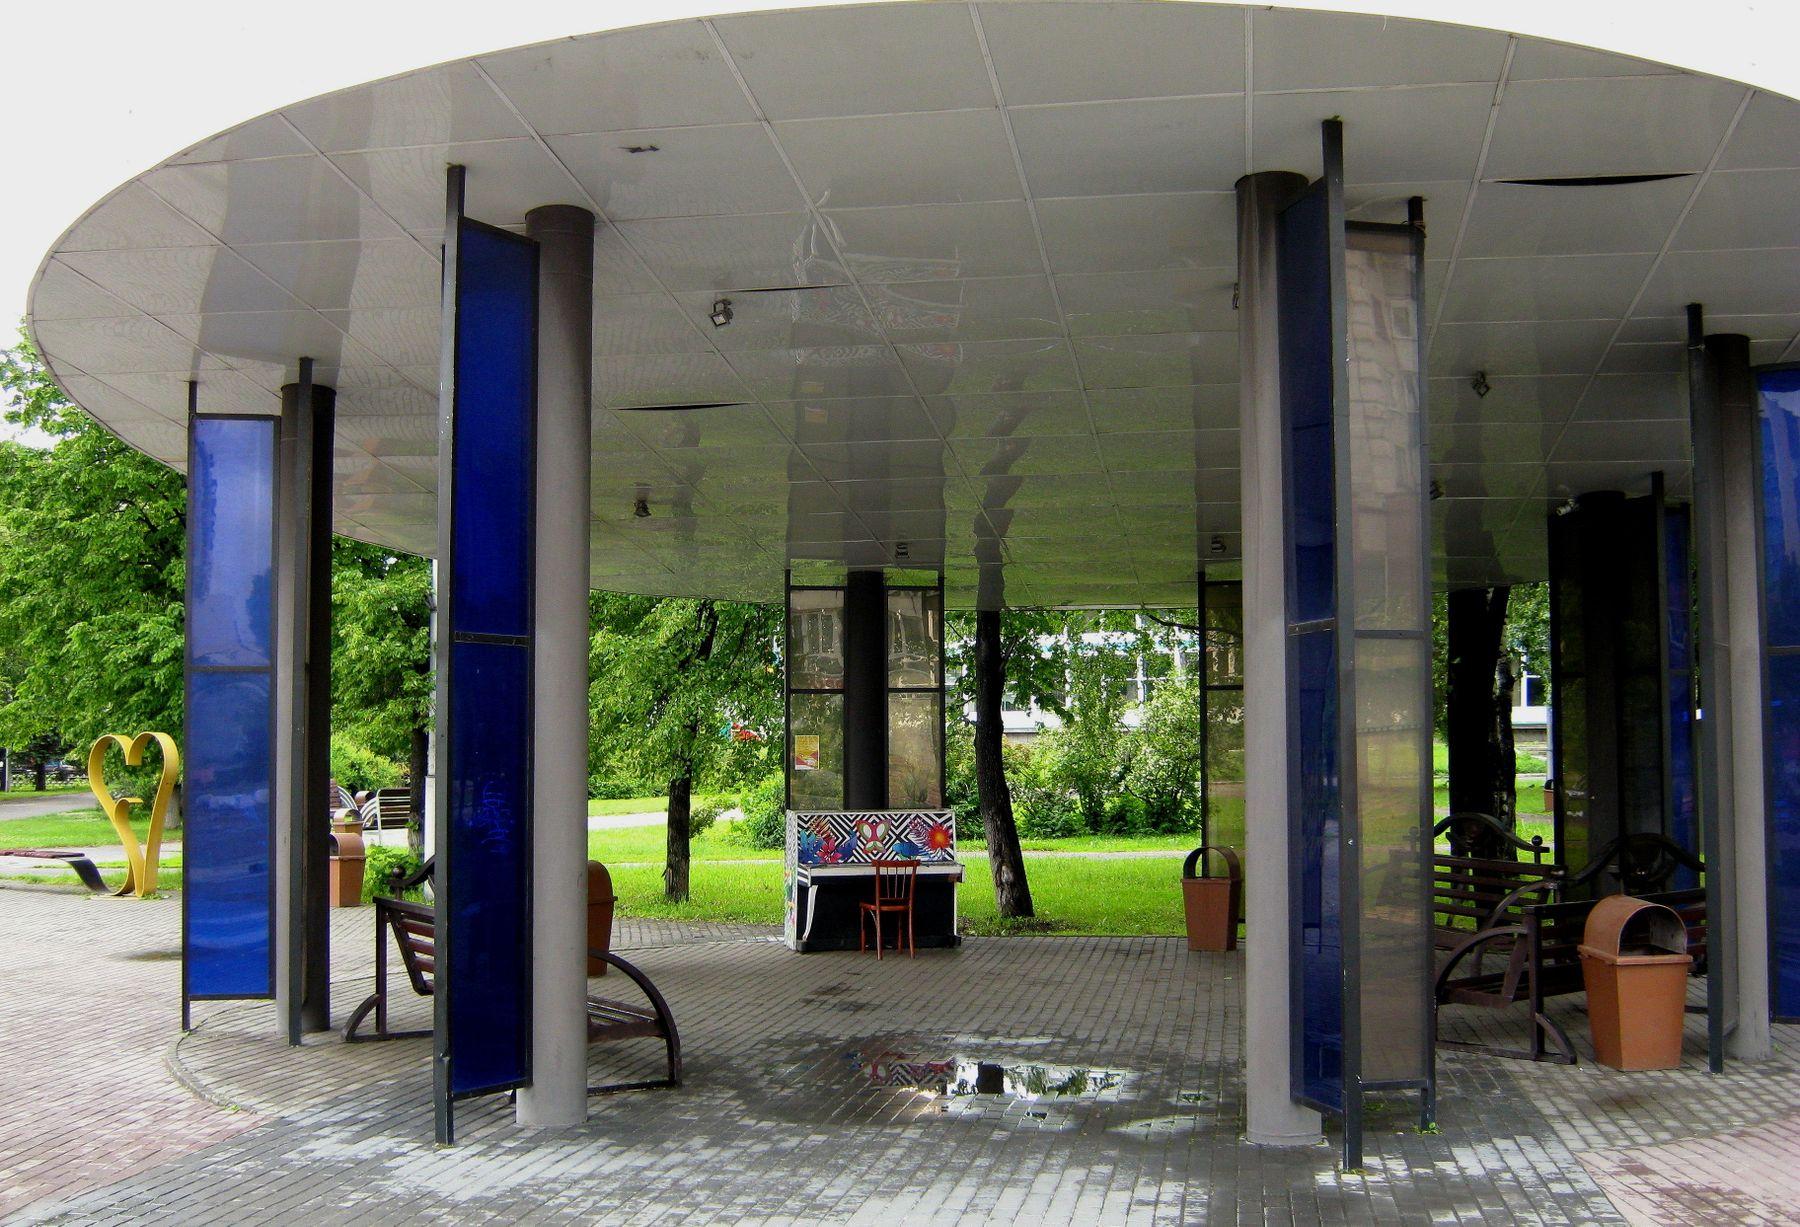 Арт-сквер. Путешествия архитектура природа арт техника